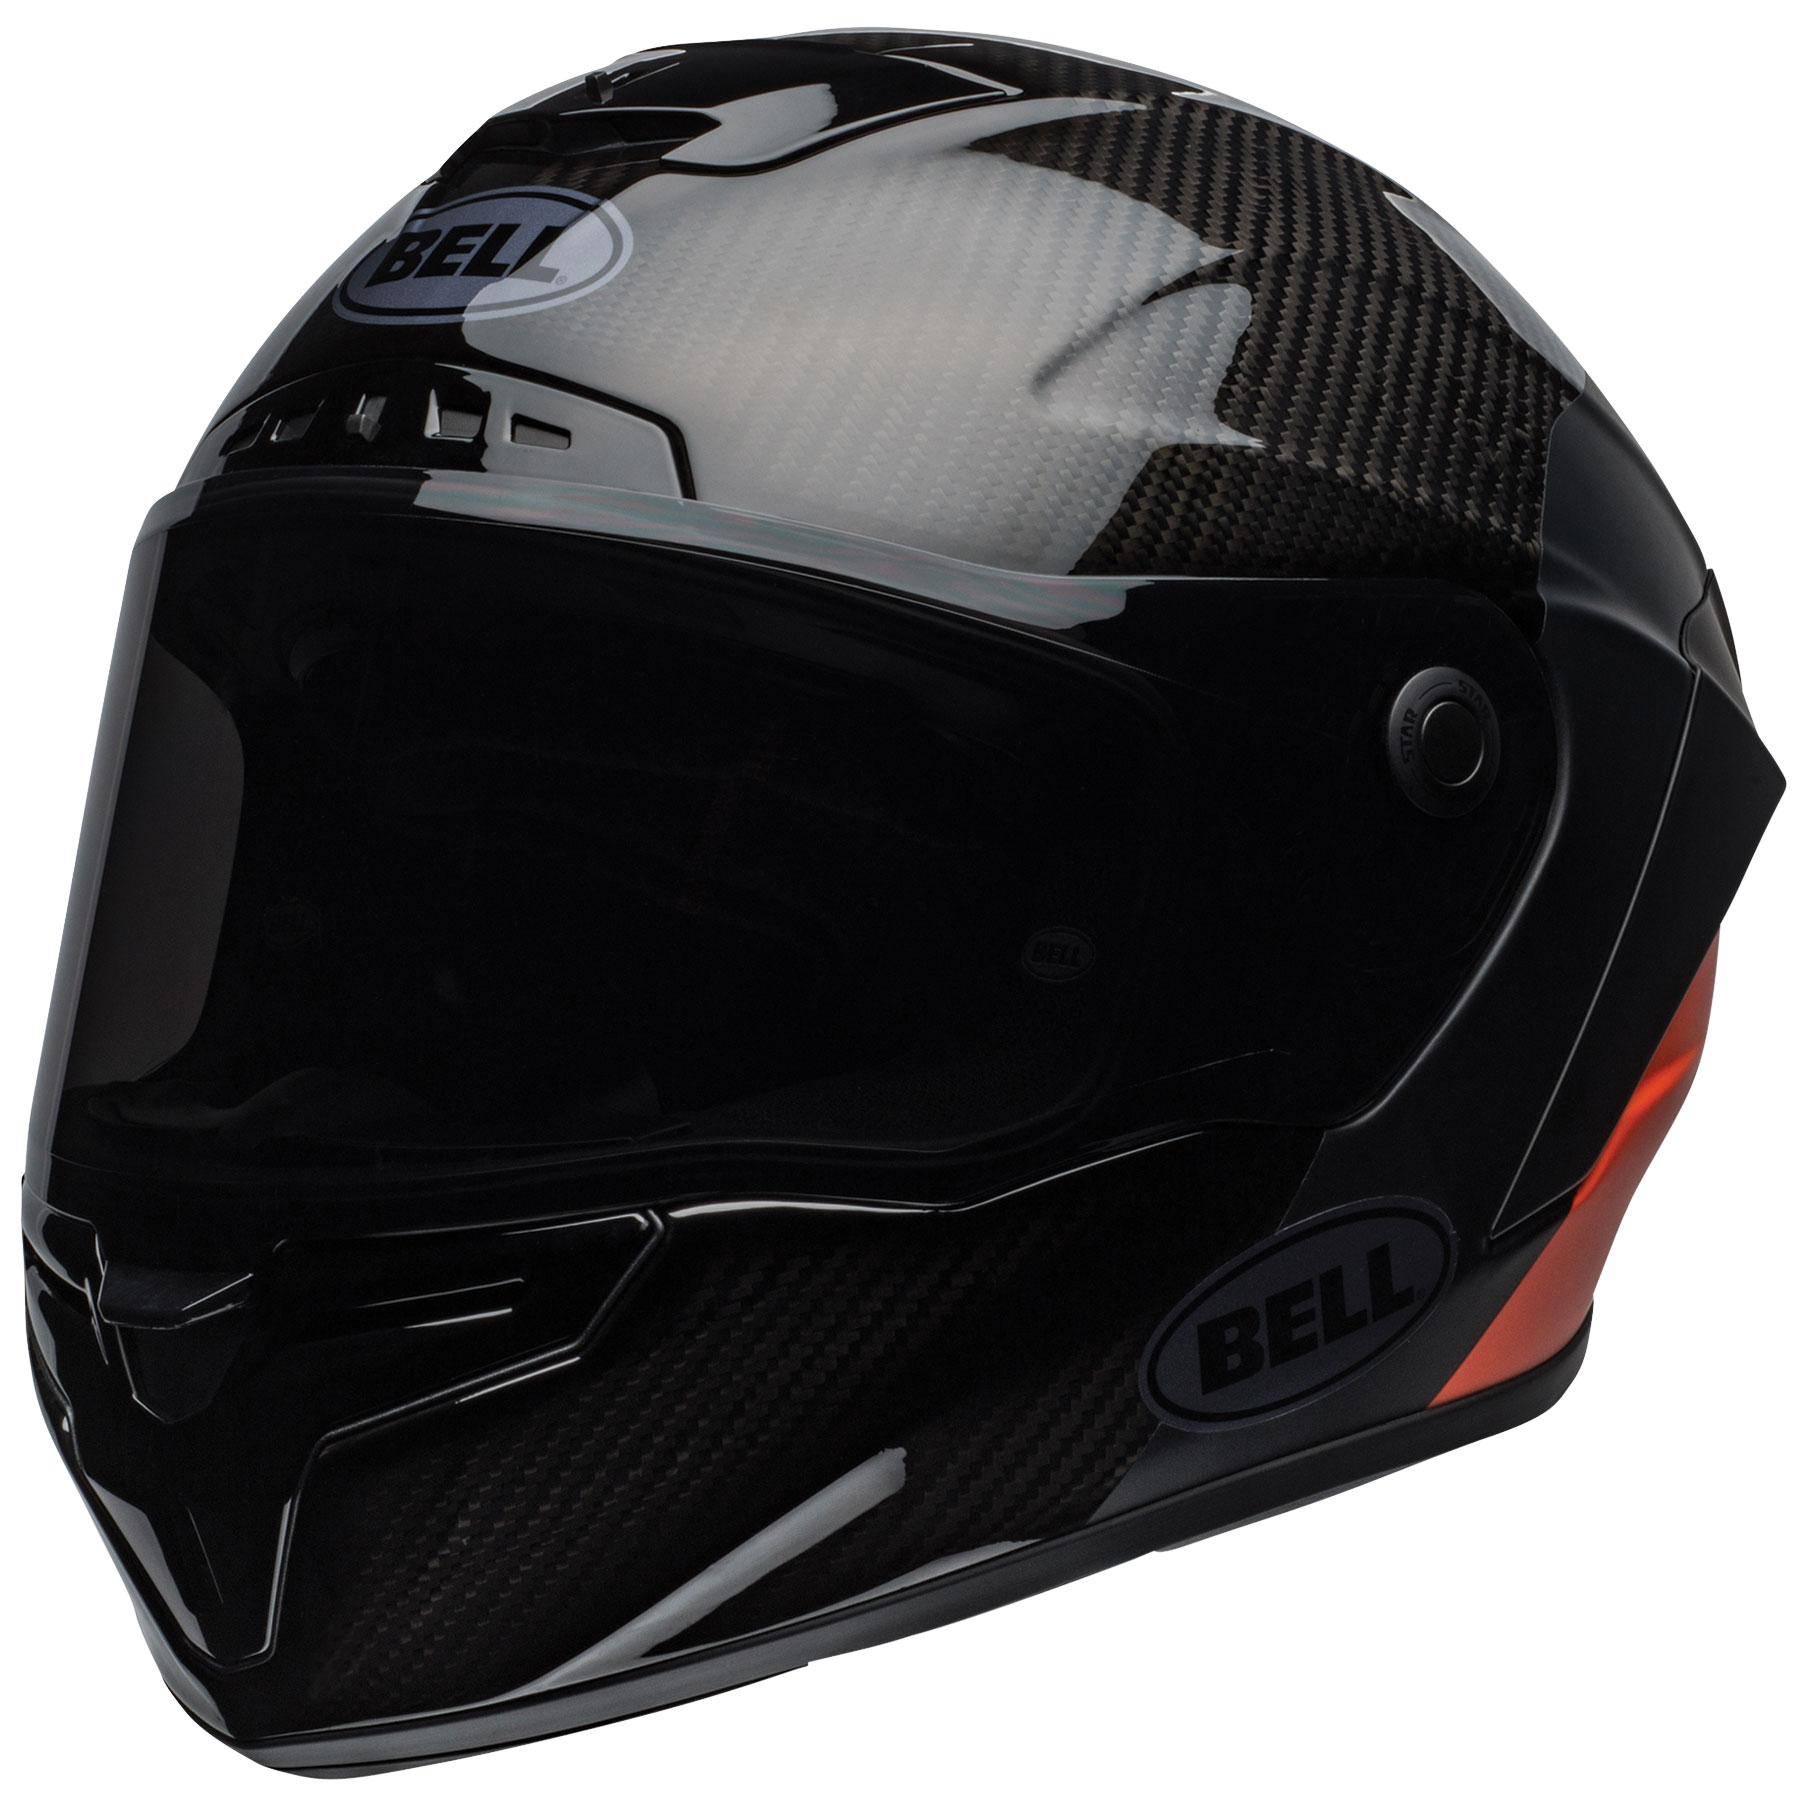 Bell Race Star Flex DLX Lux Full Face Helmet